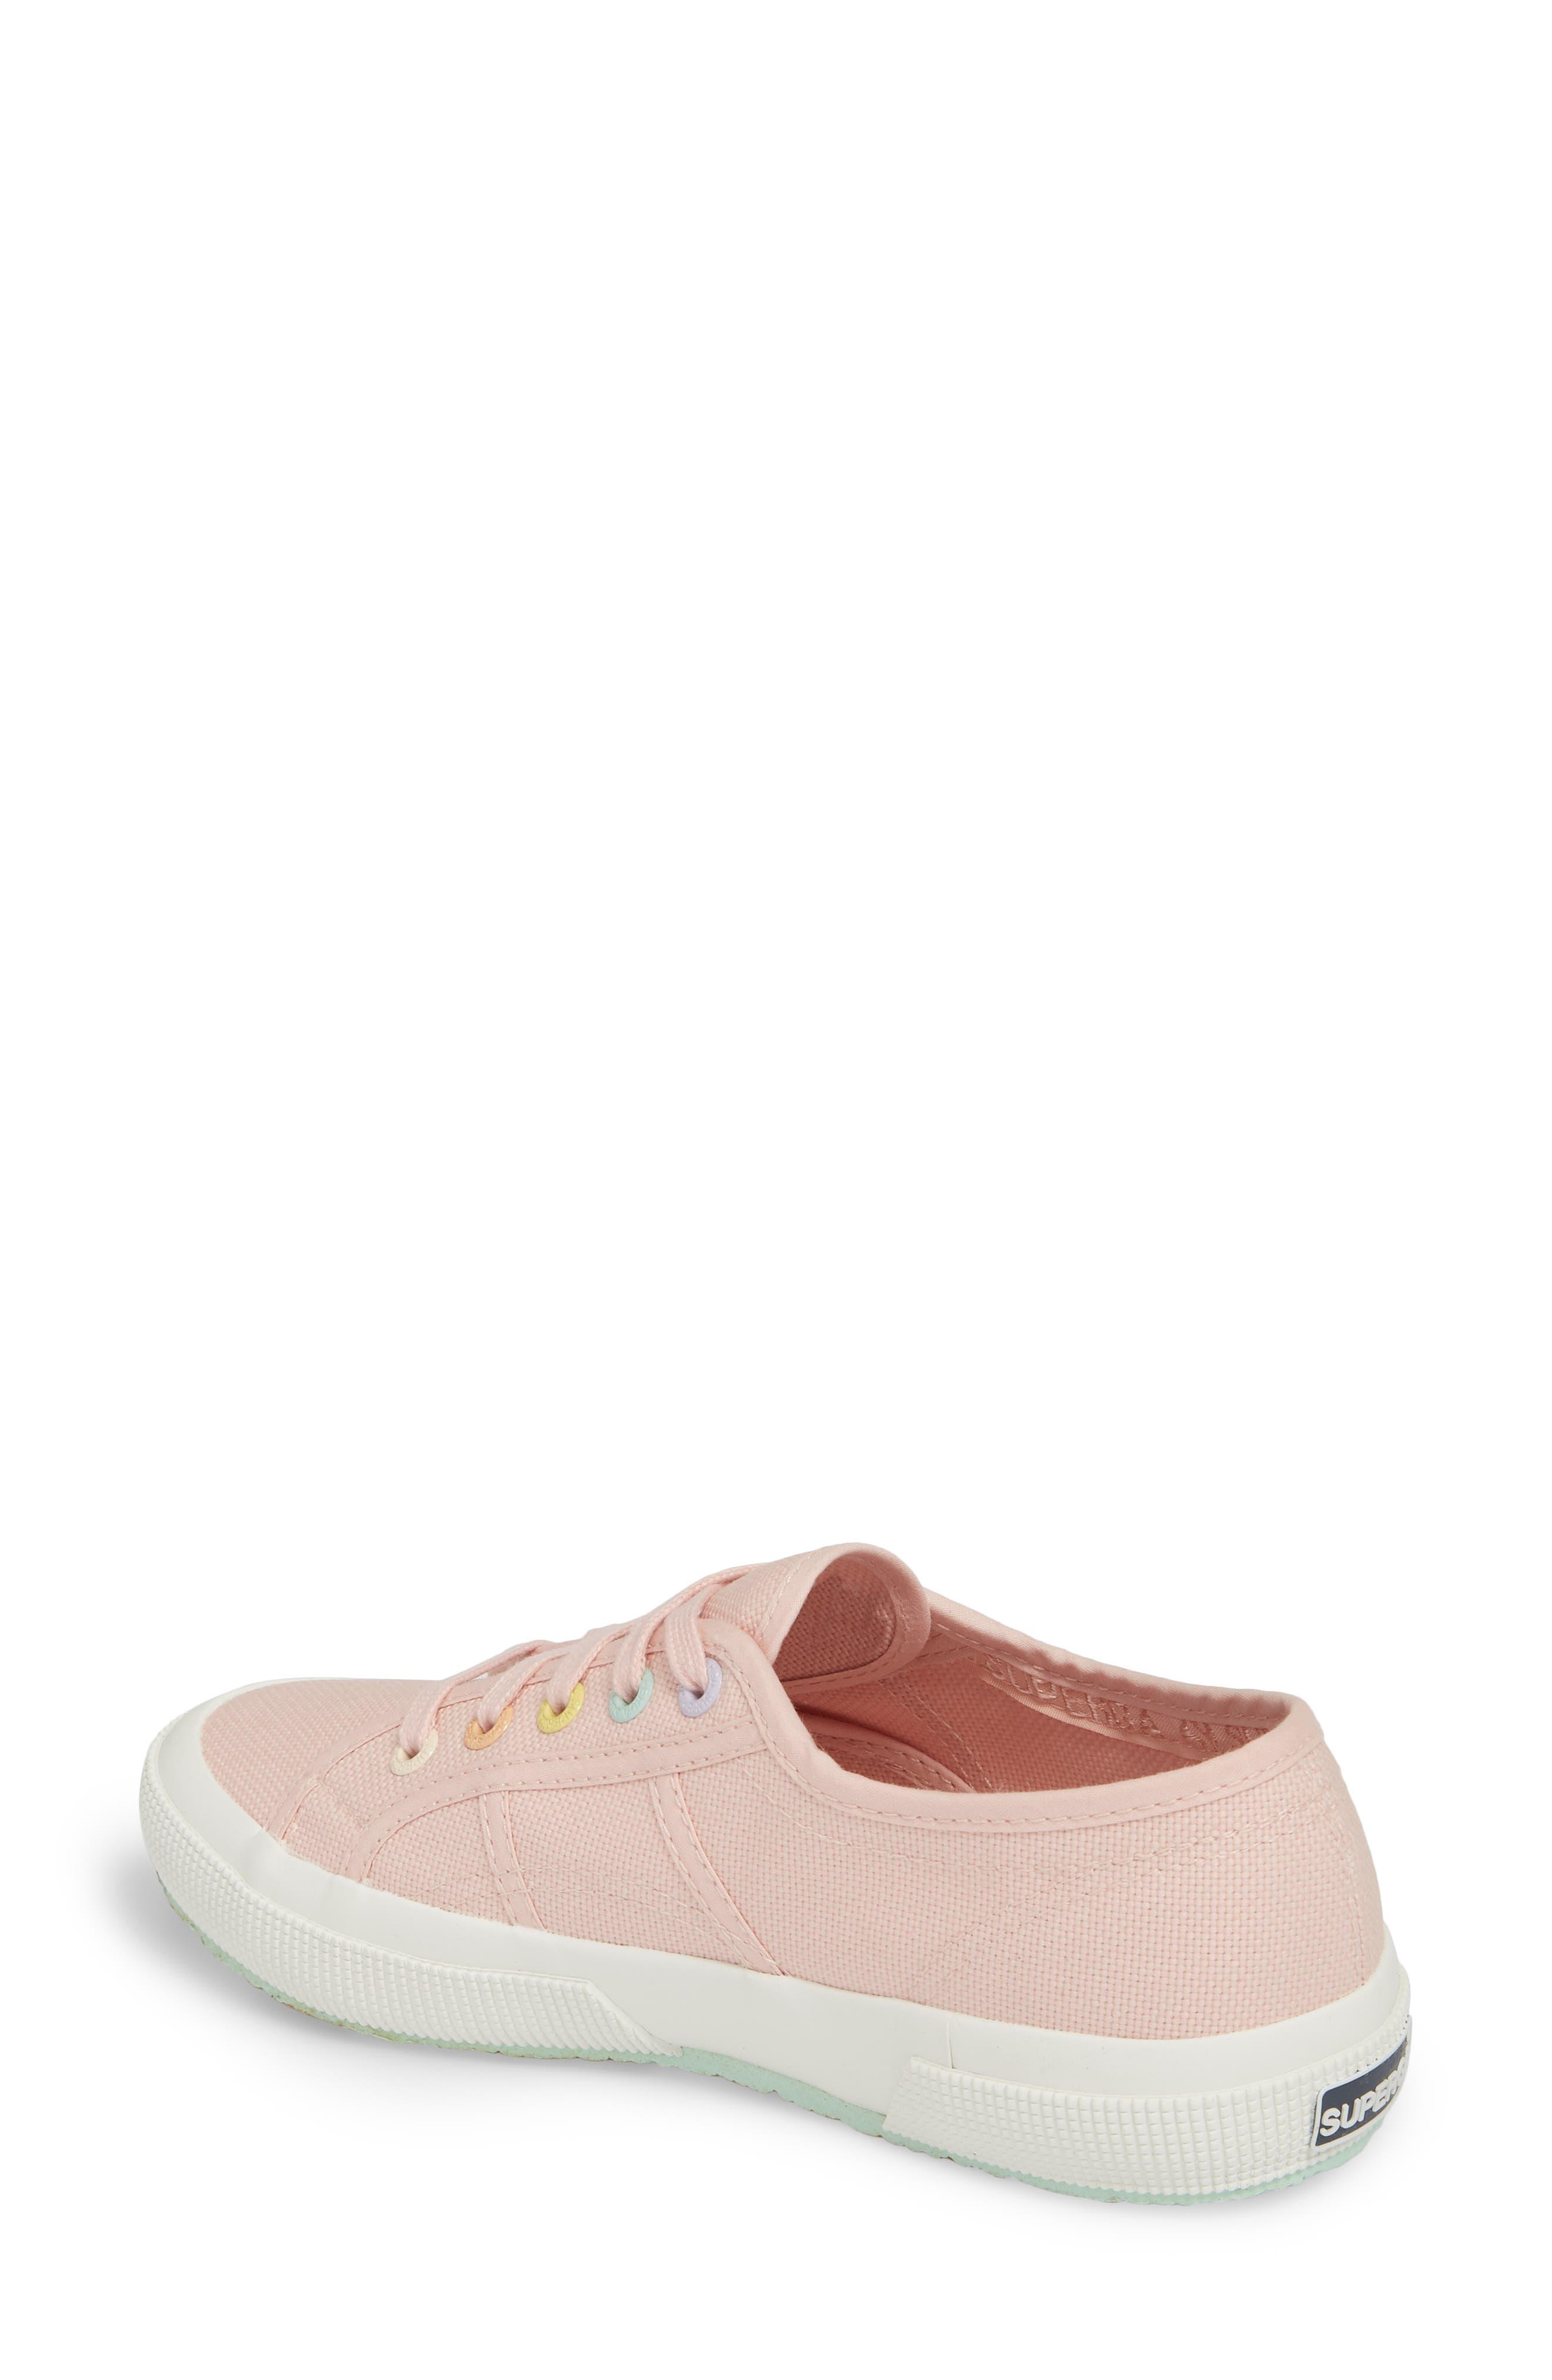 2750 Rainbow Sneaker,                             Alternate thumbnail 2, color,                             Light Pink